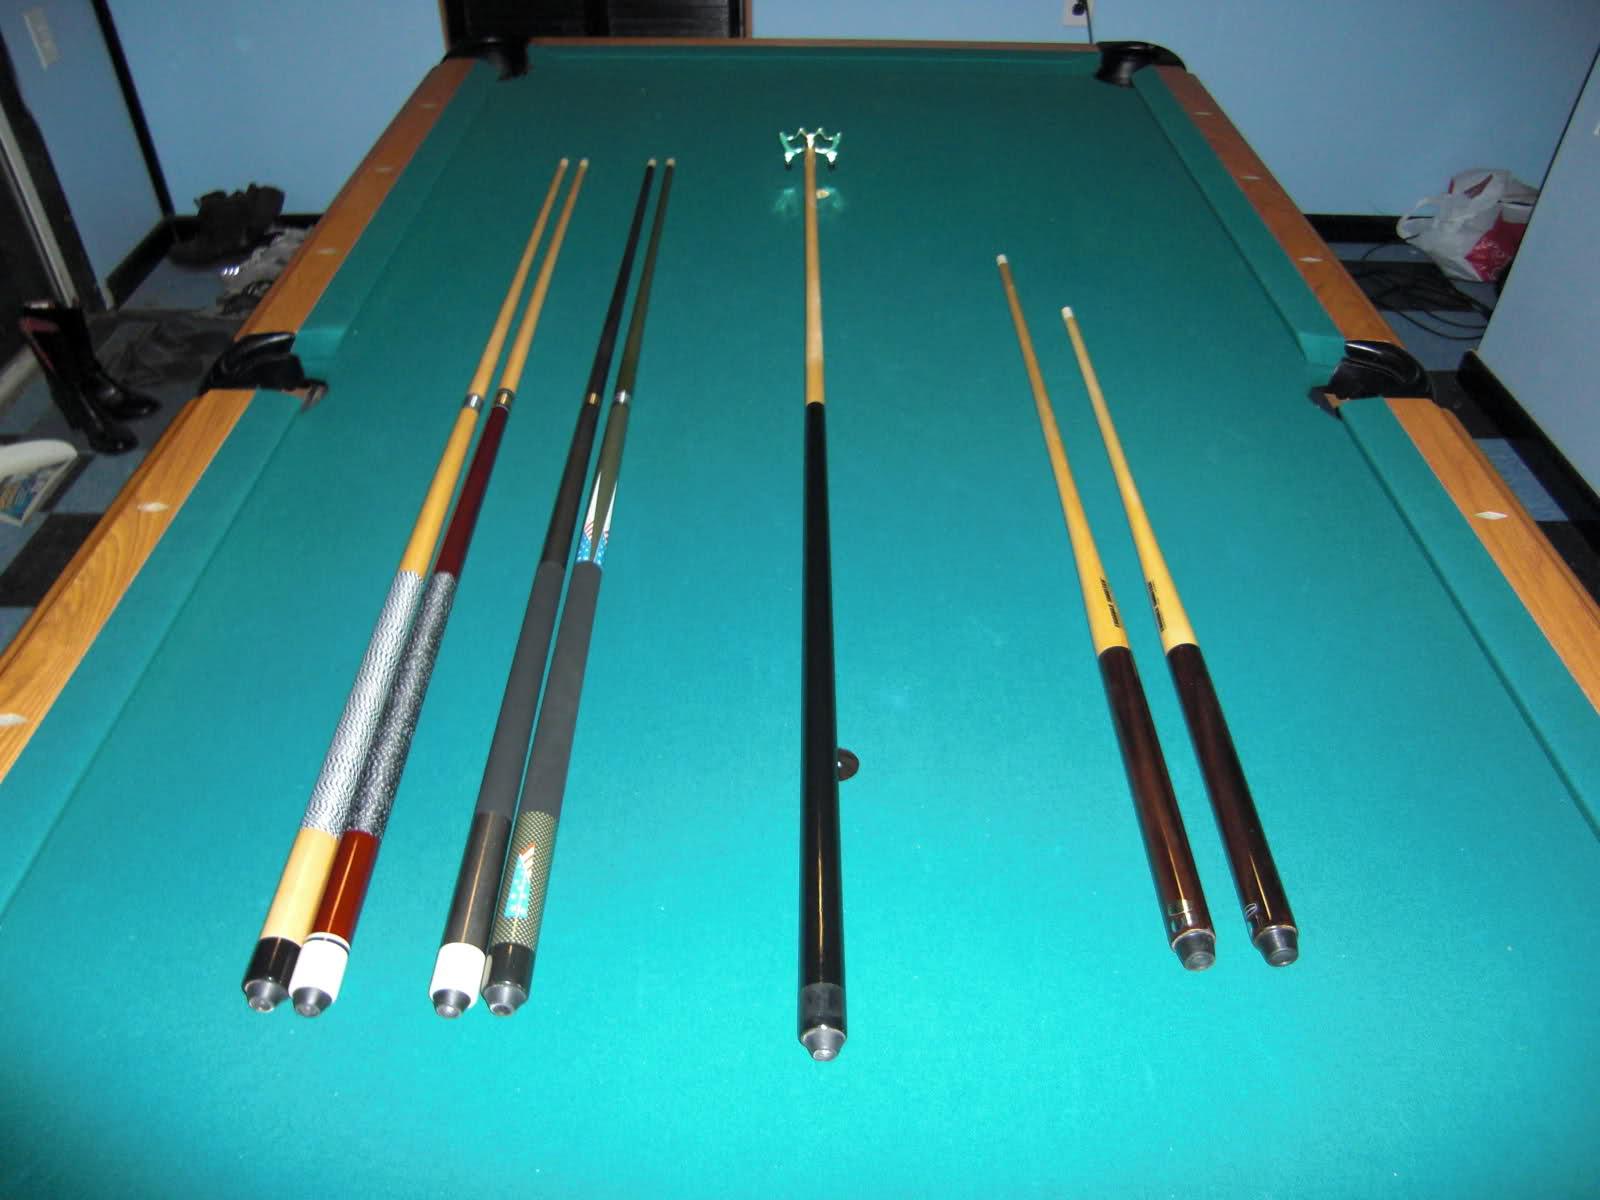 Pool Tables for Sale Walmart | Mizerak Pool Table | Mizerak Bumper Pool Table